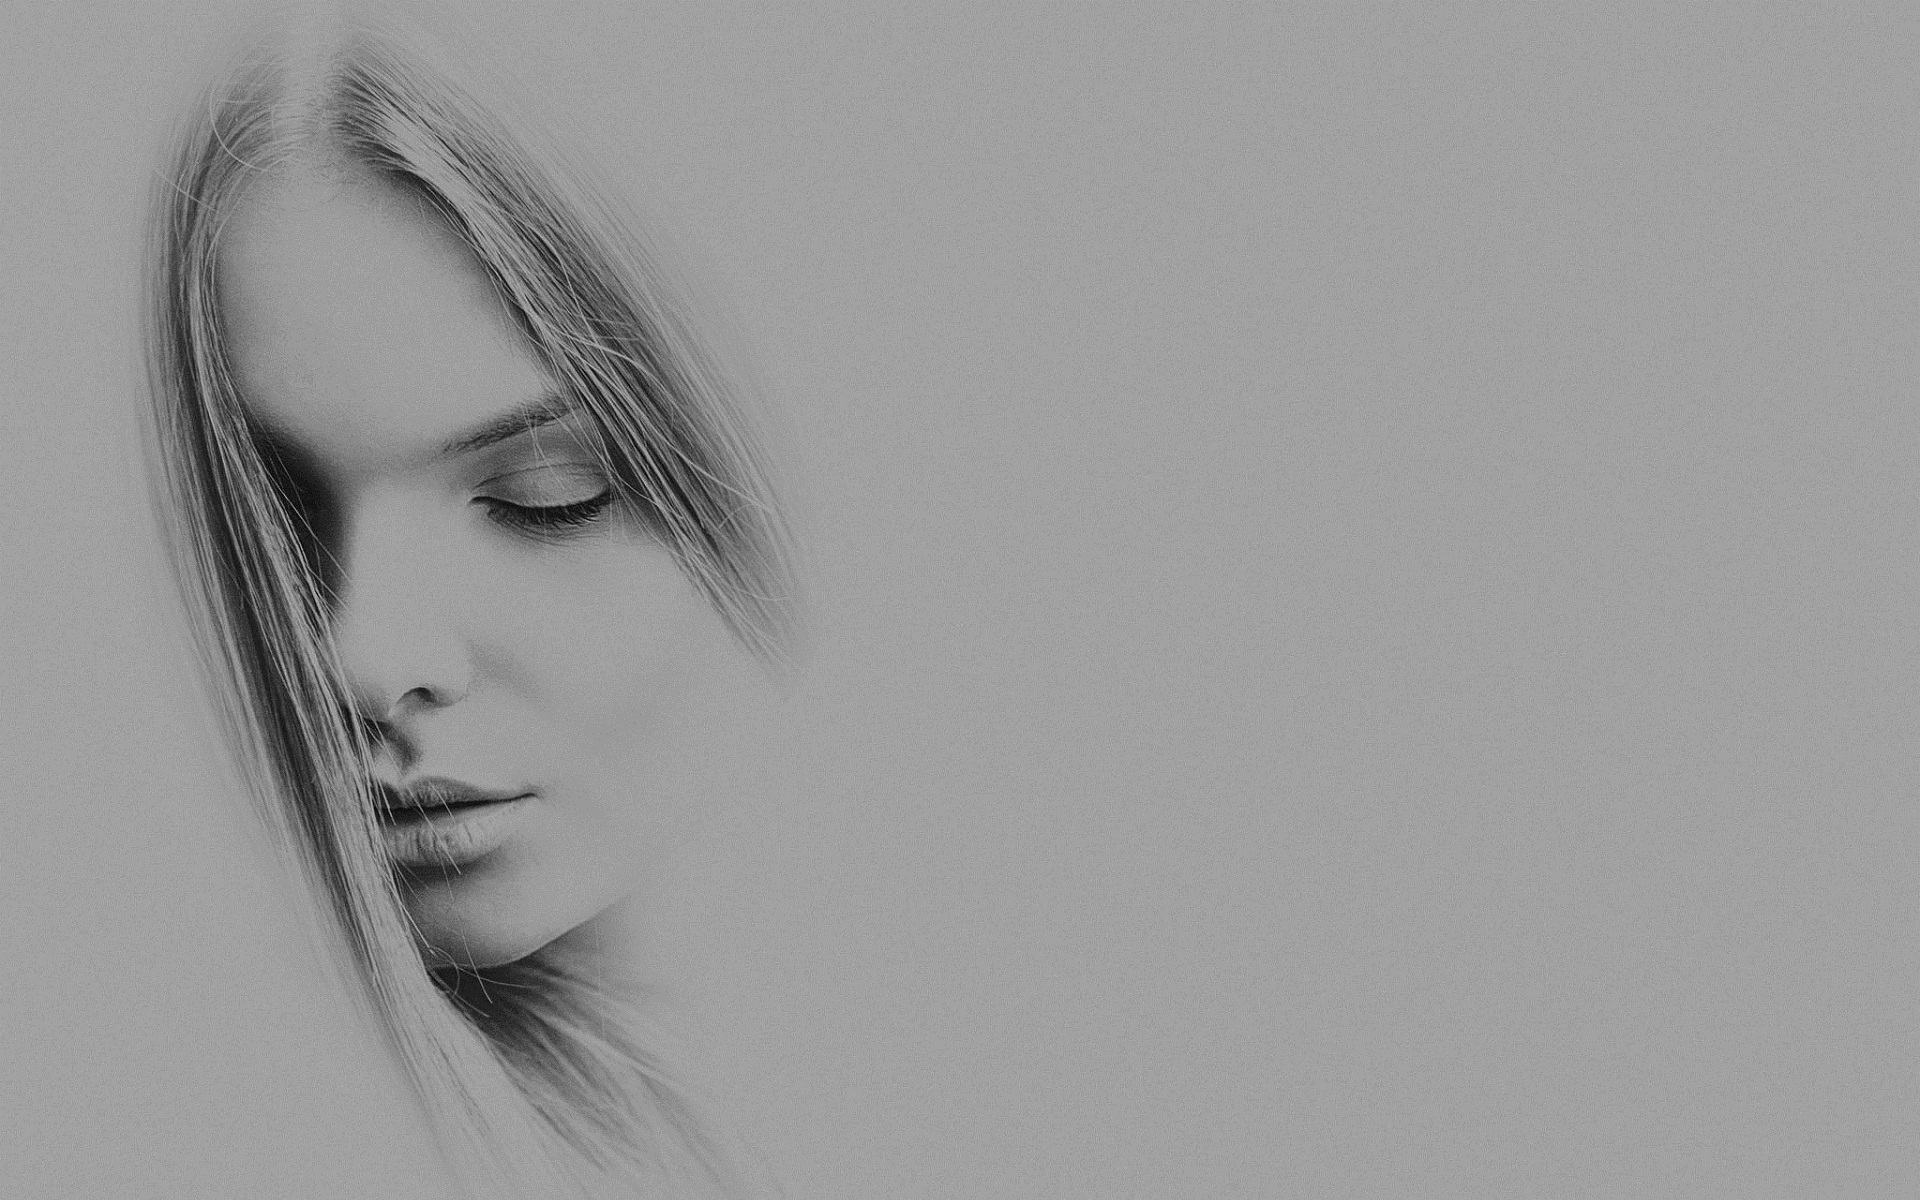 Sad Woman paintings